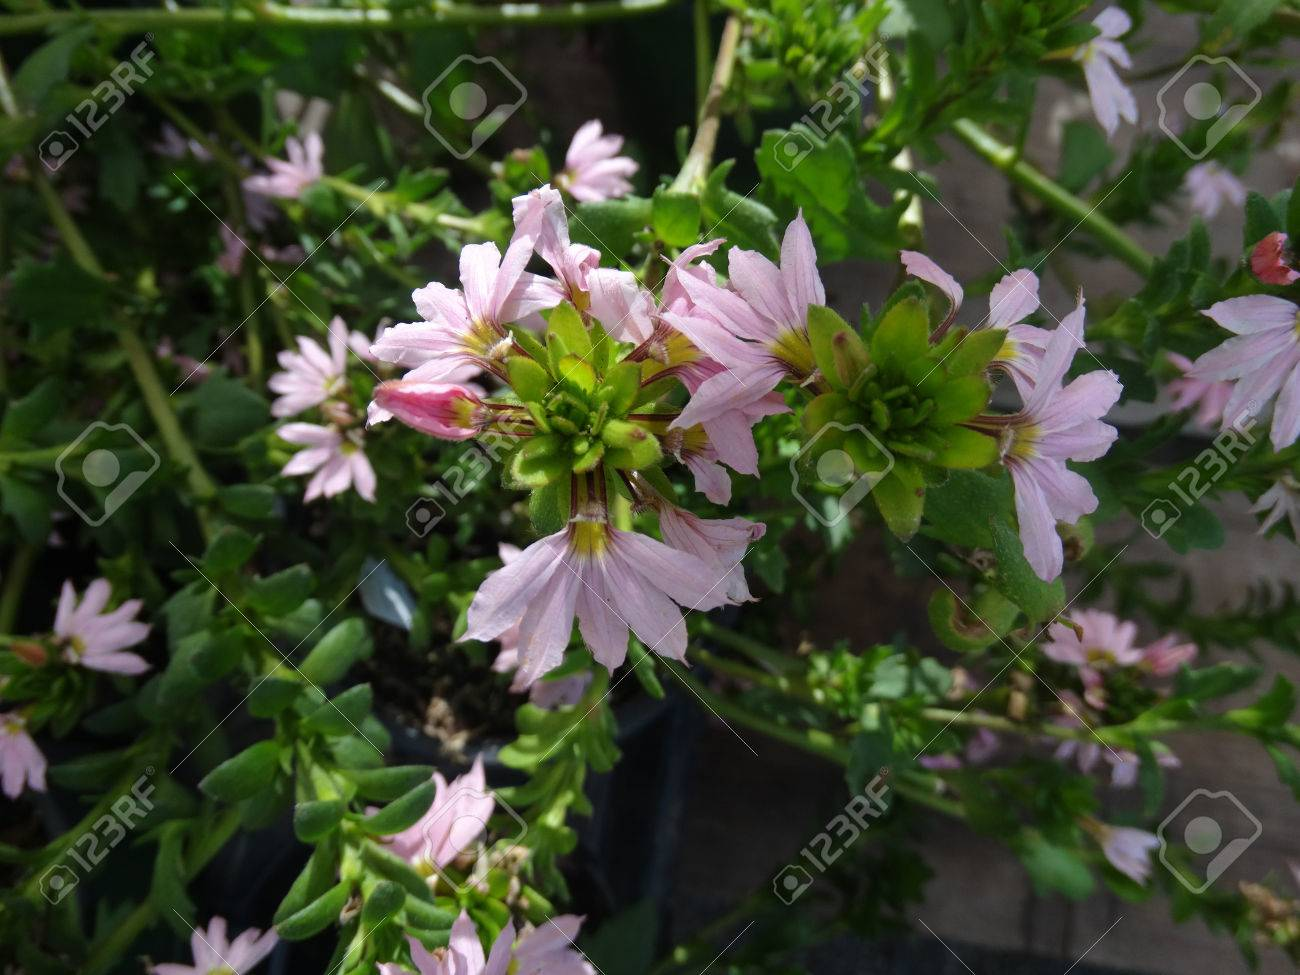 Scaevola aemula bombay pink semitrailing annual with bright stock scaevola aemula bombay pink semitrailing annual with bright green leaves and fan shaped pink flowers izmirmasajfo